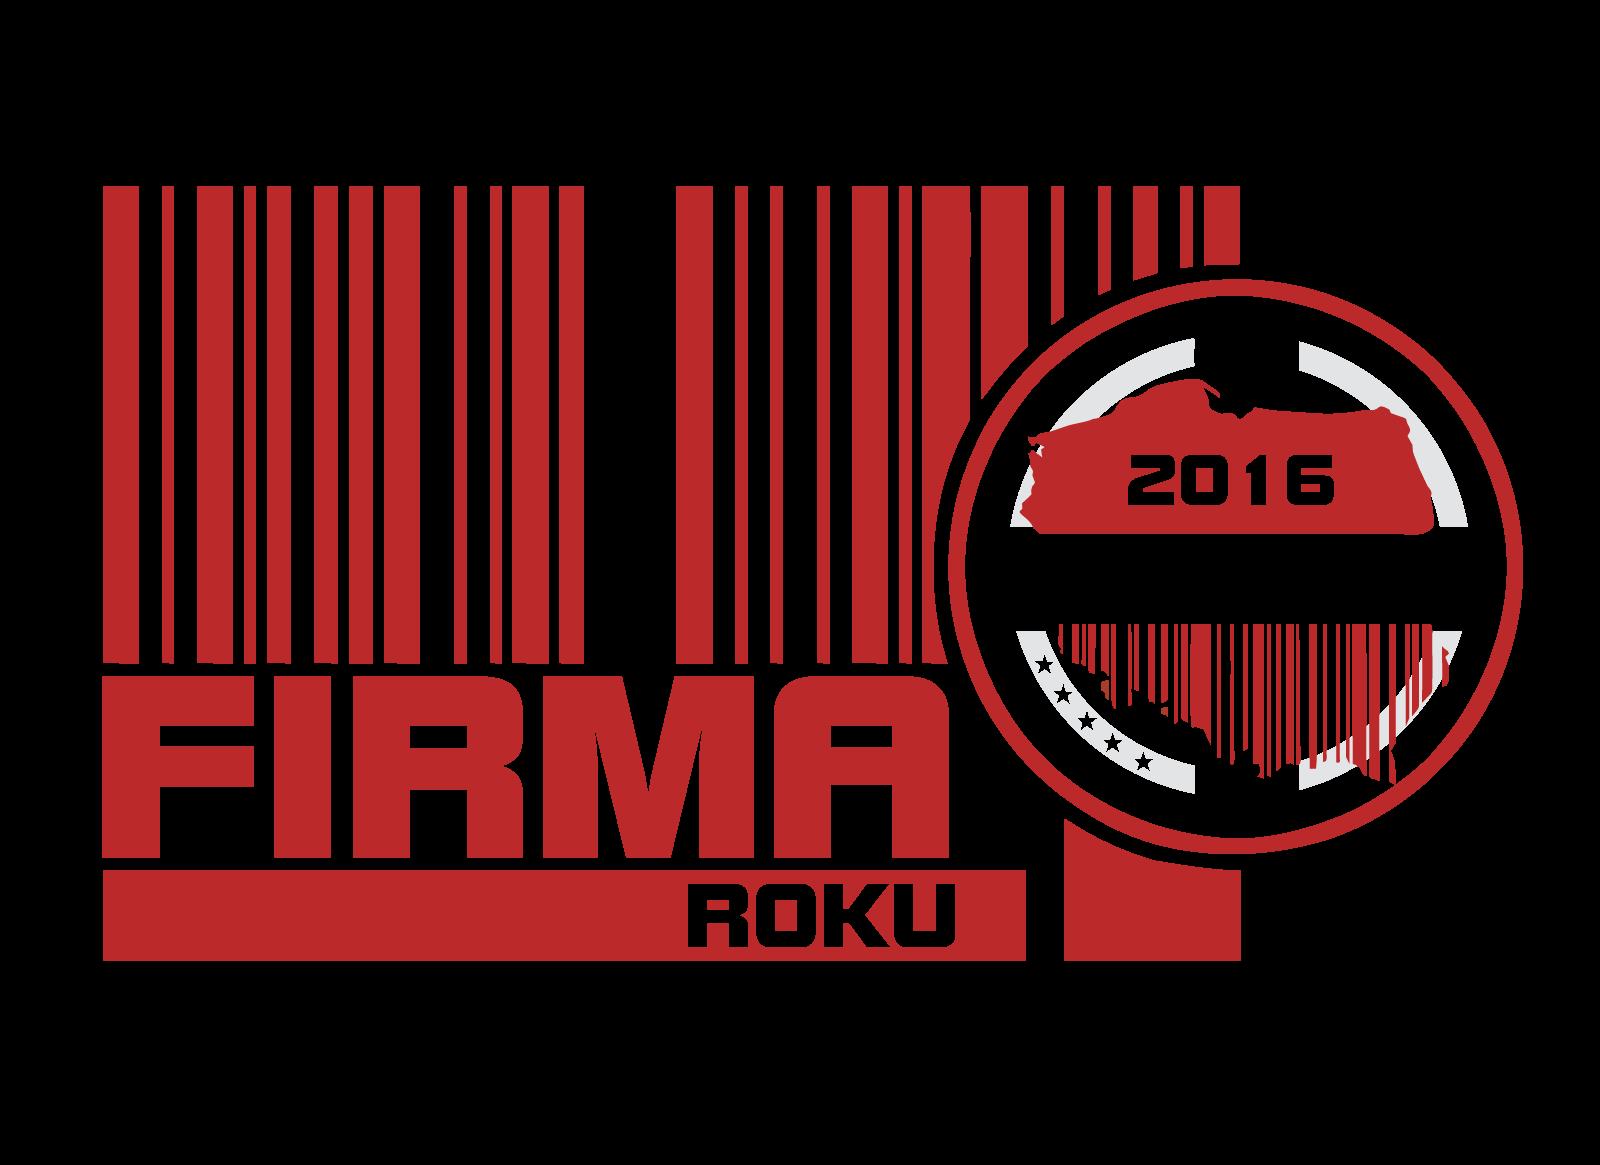 Ogólnopolski Program Firma Roku 2016